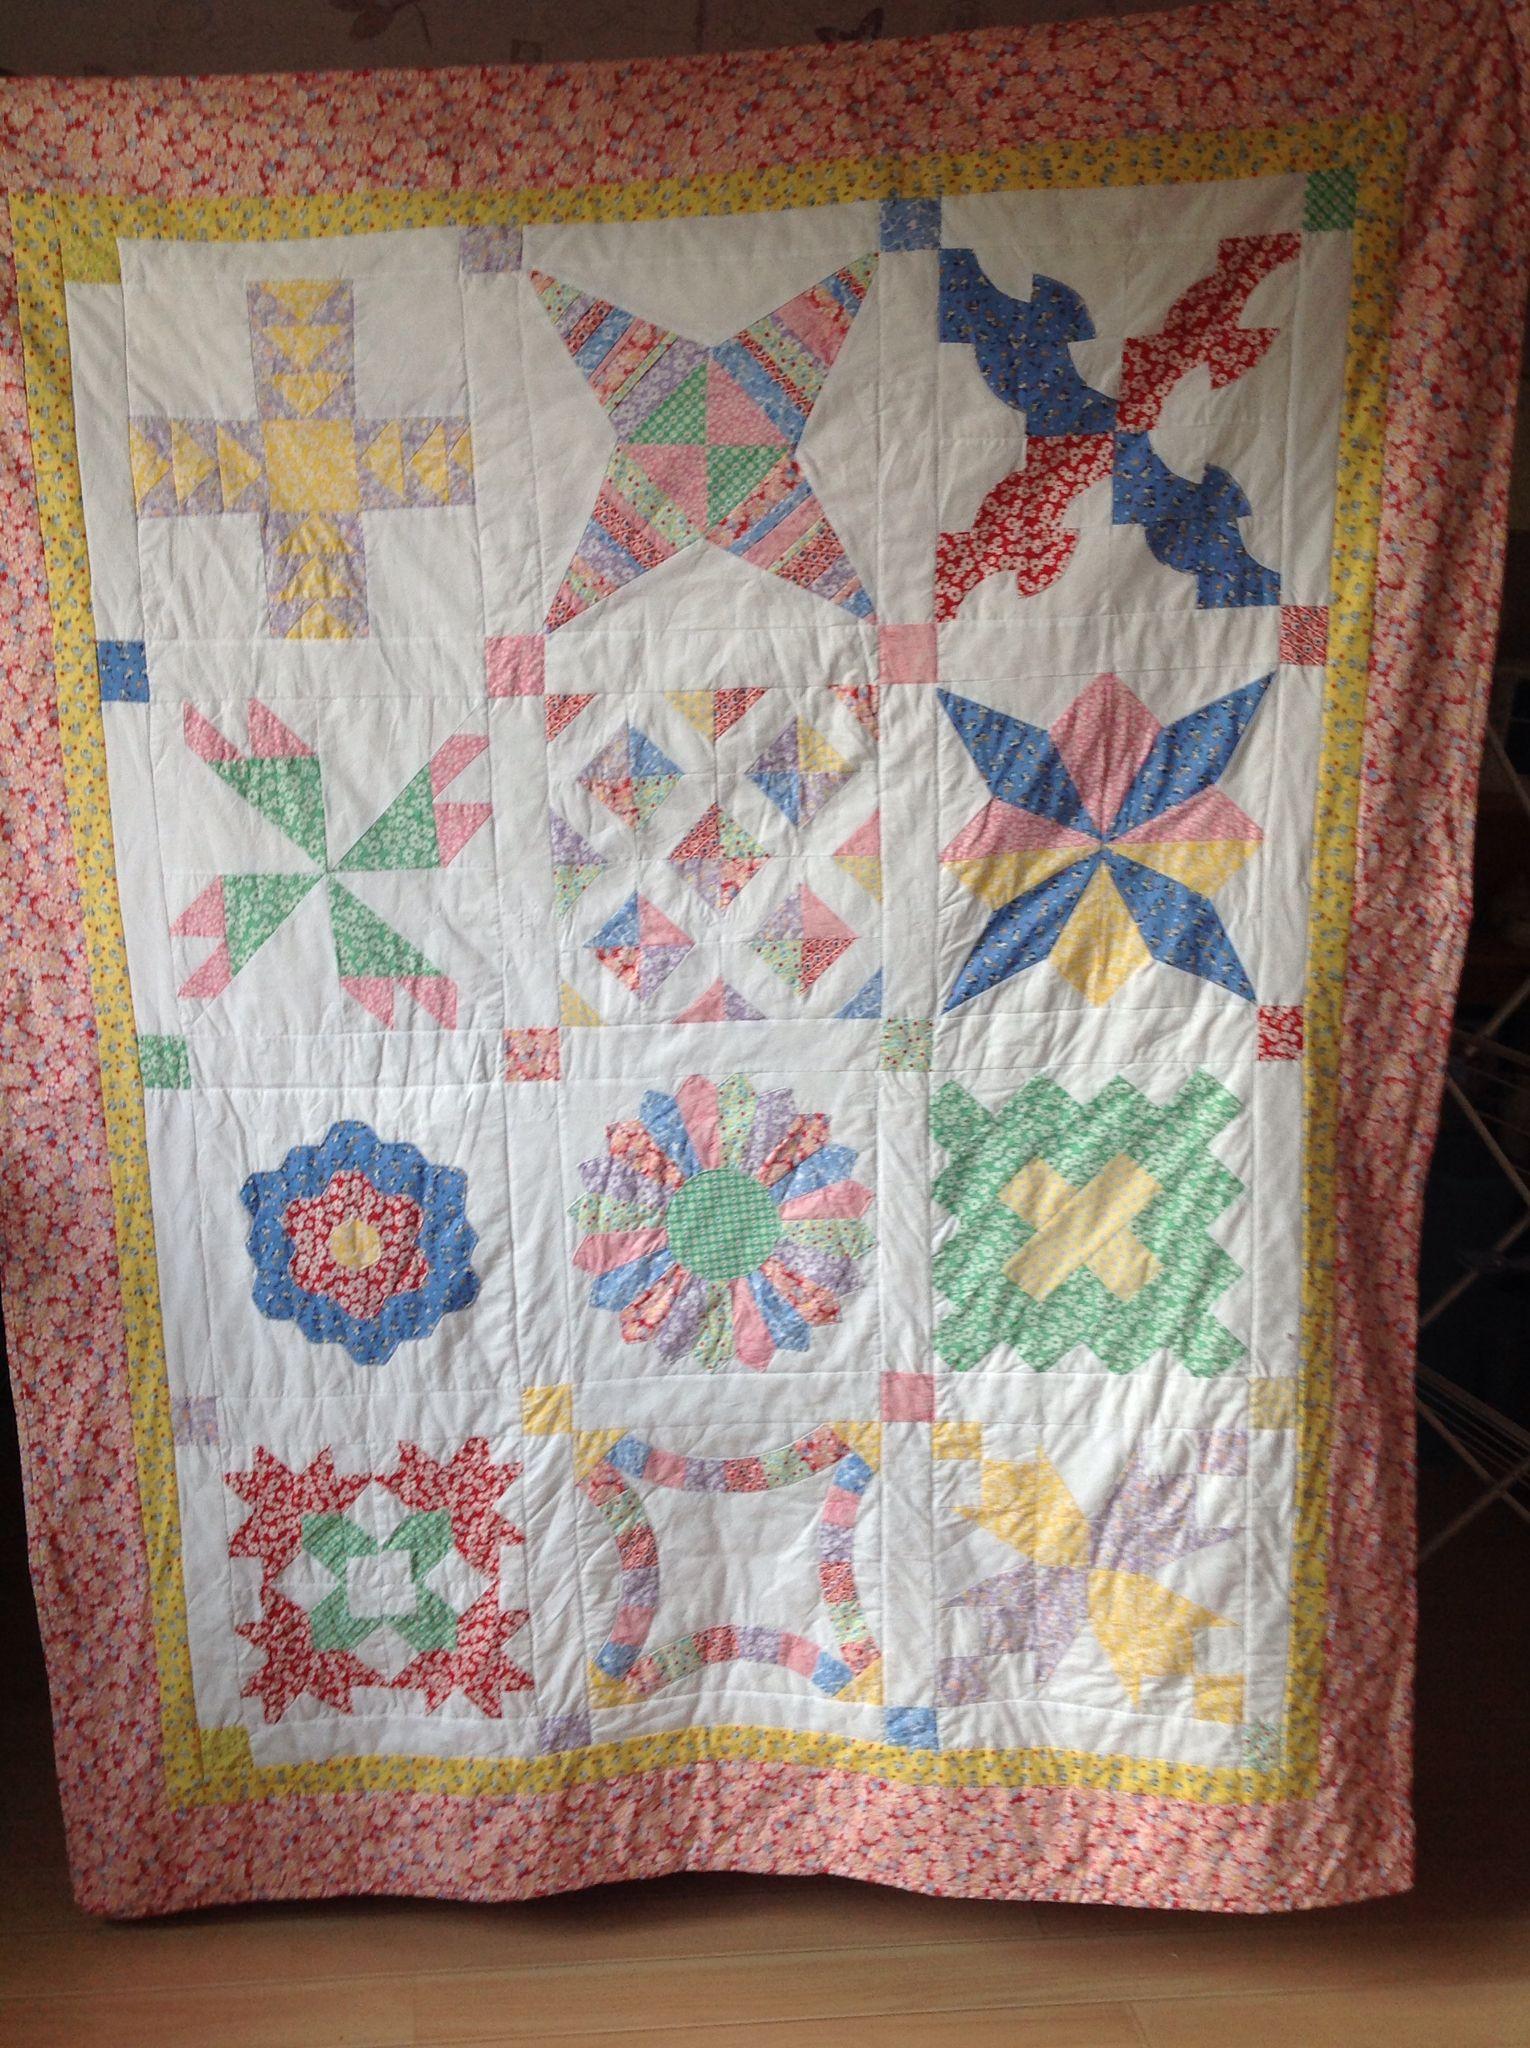 Eleanor Burns's Egg Money quilt | quilt in a day with Elenor Burns ... : egg money quilts by eleanor burns - Adamdwight.com